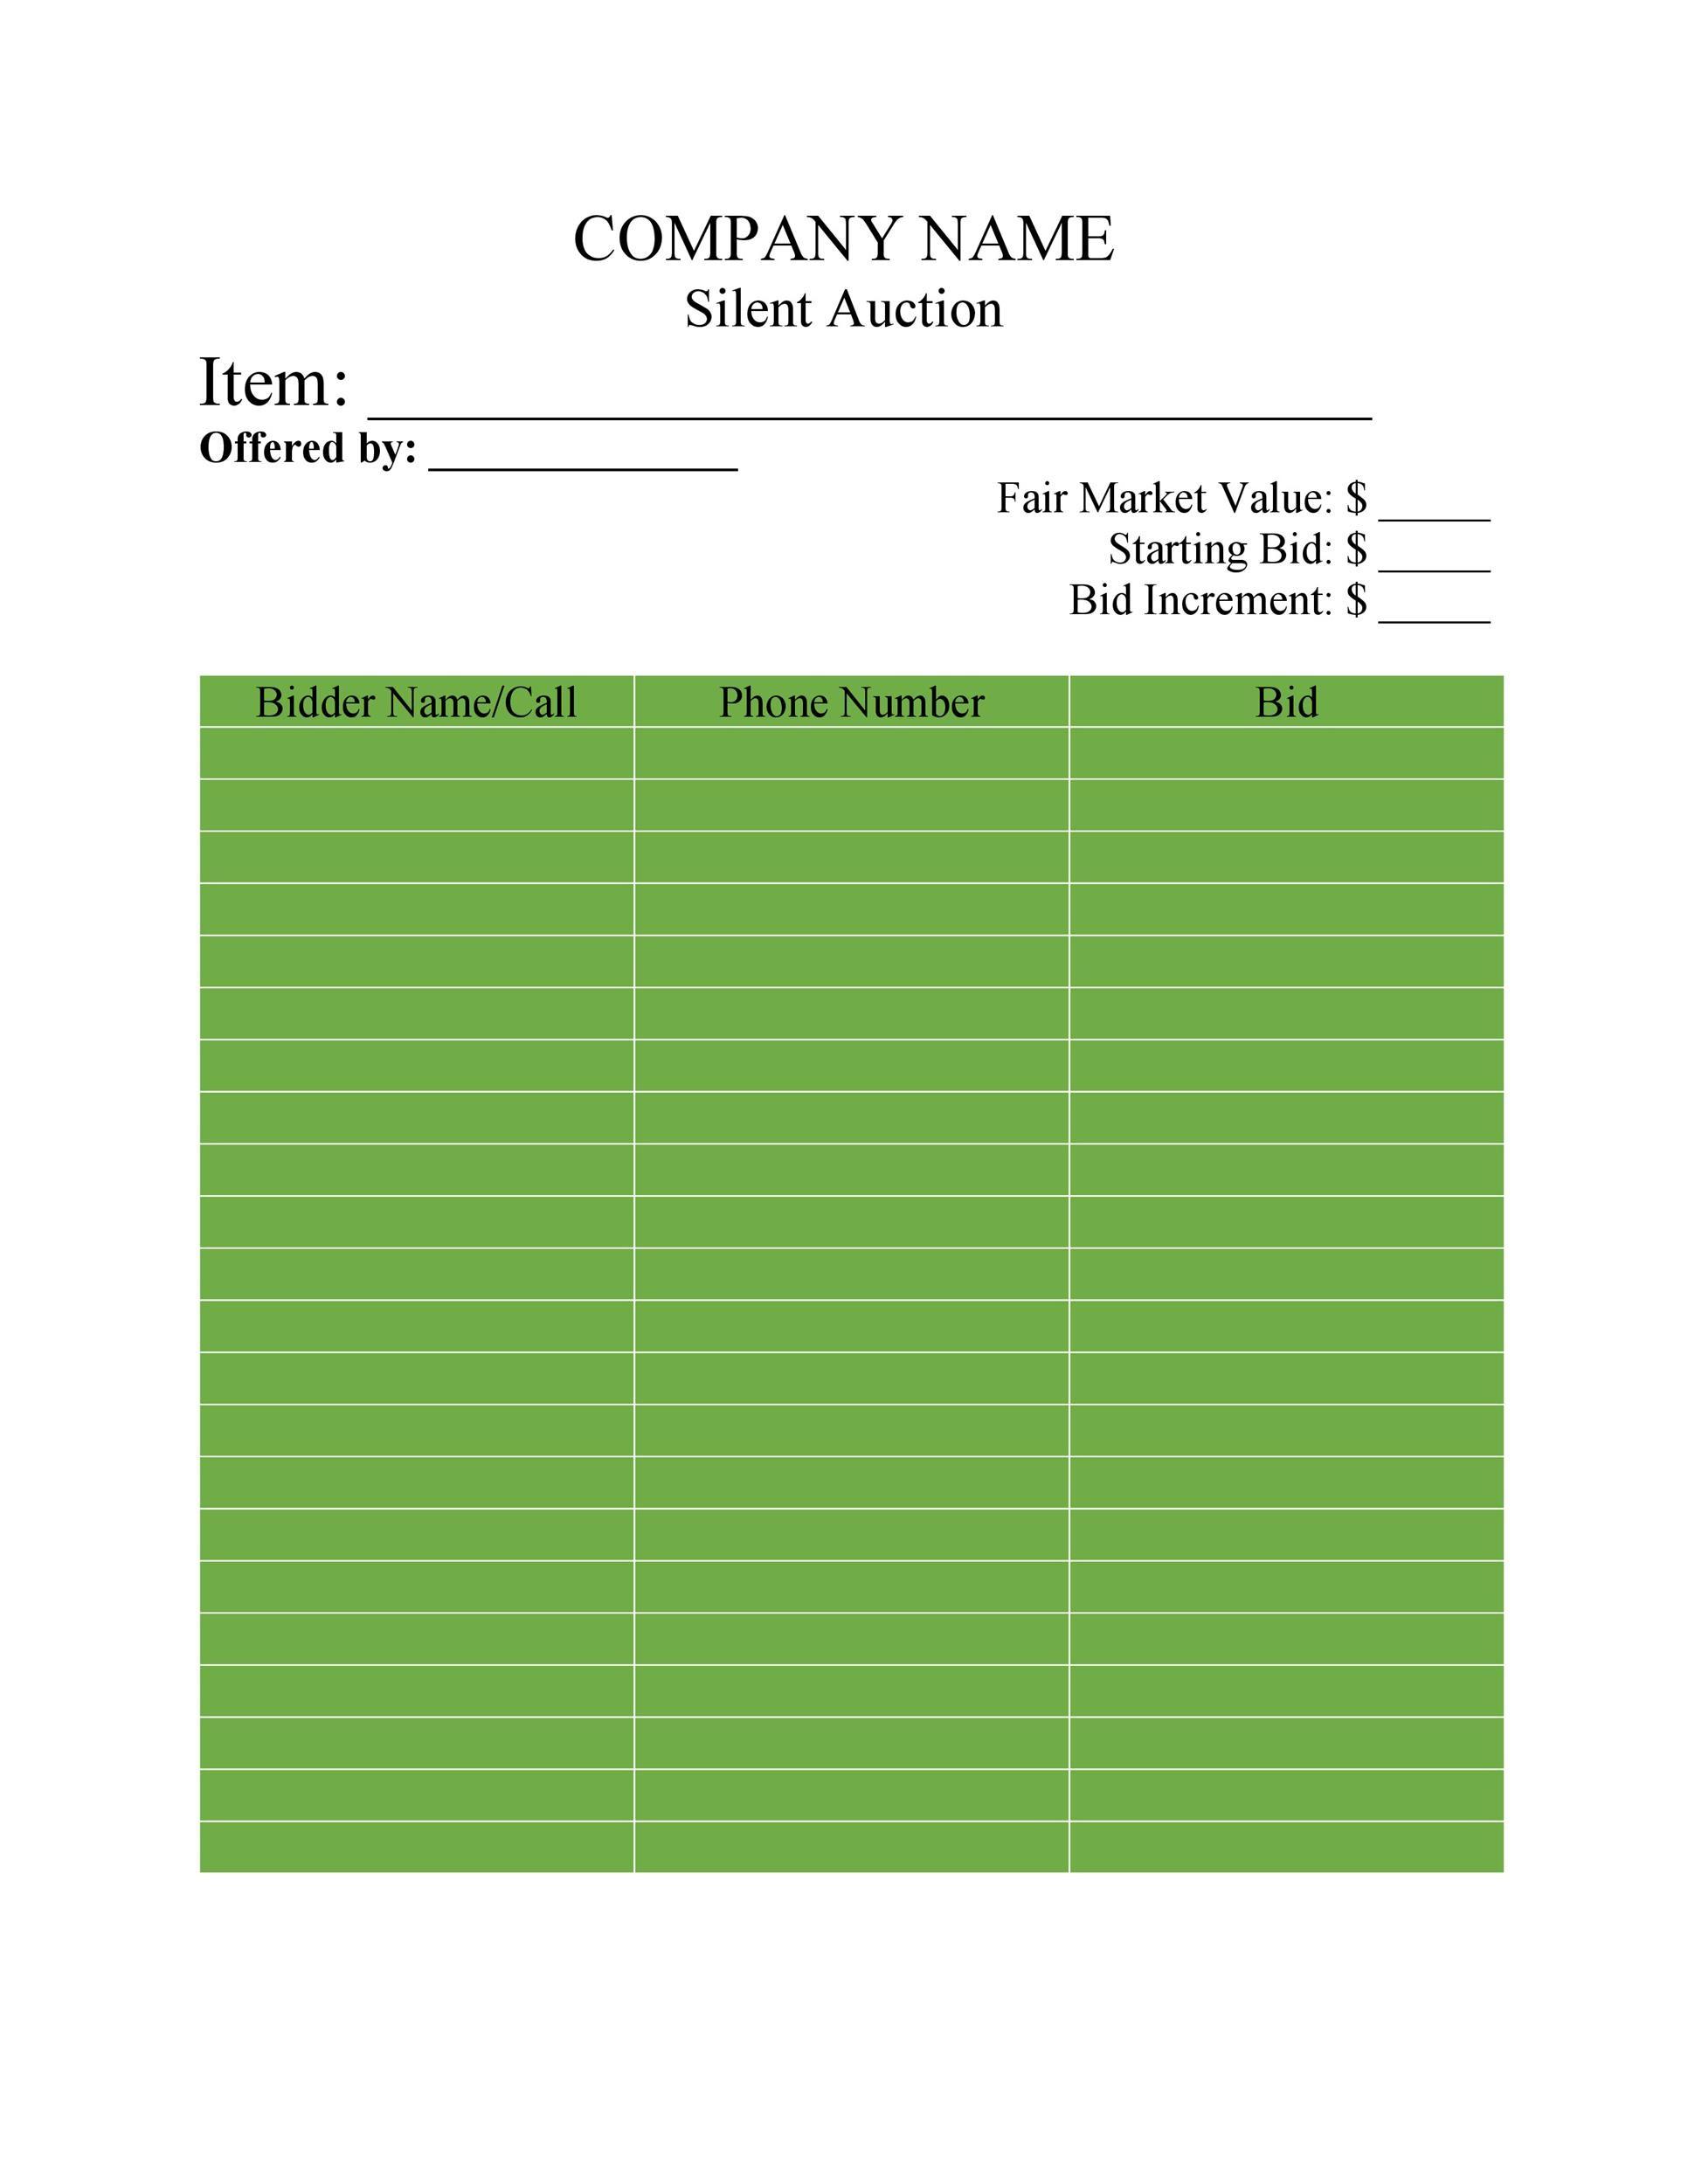 Free Silent Auction Bid Sheet 34